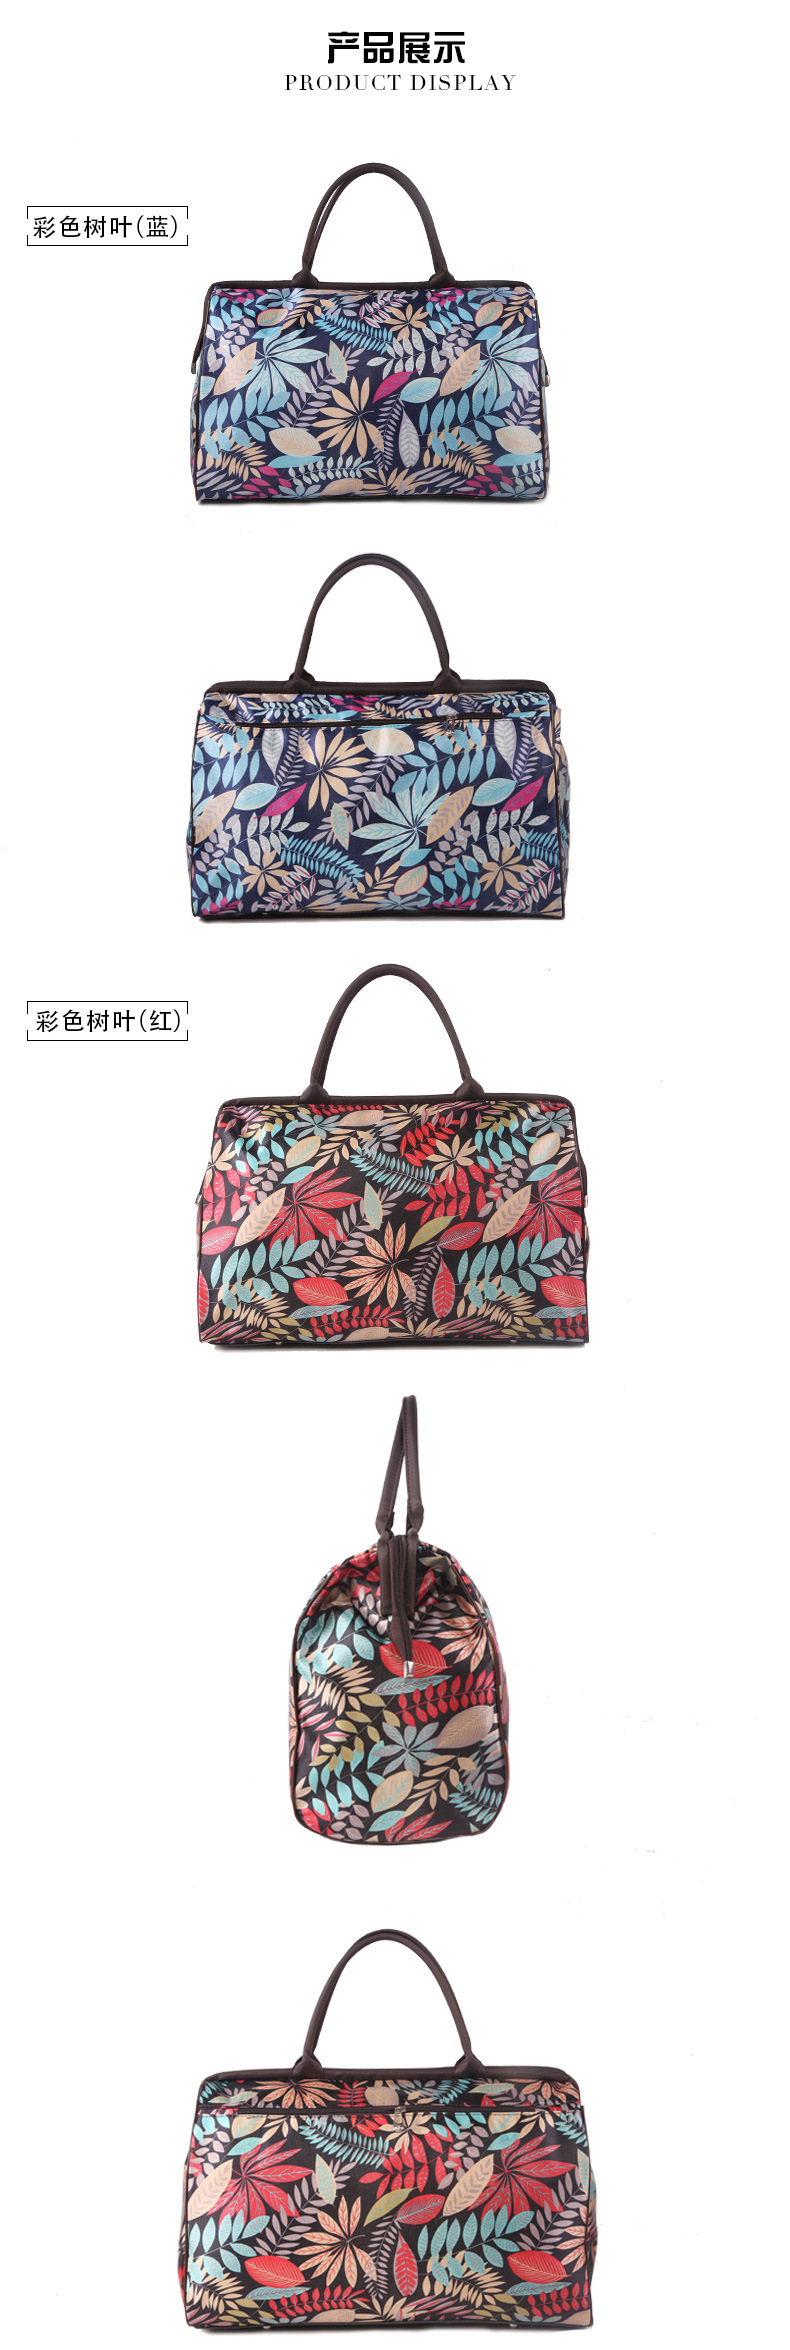 7162481e384a Casual Travel Bags 2017 Fashion Korean Large Capacity Luggage Travel ...